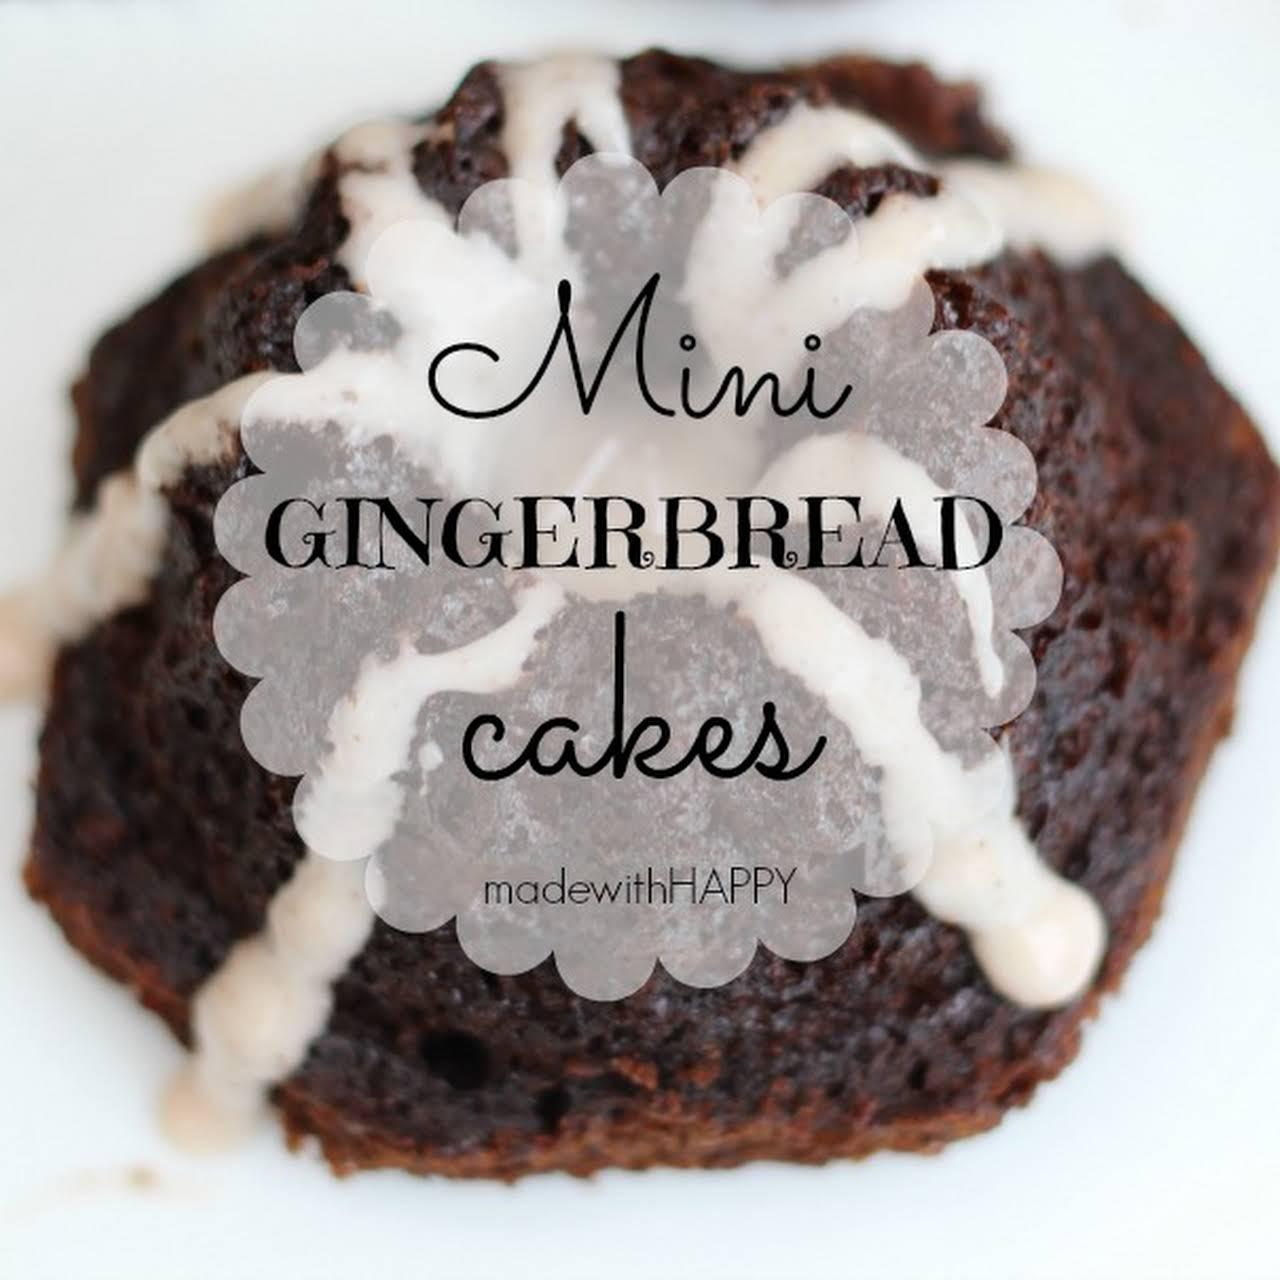 Mini Gingerbread Cakes with Cinnamon Vanilla Yogurt Frosting